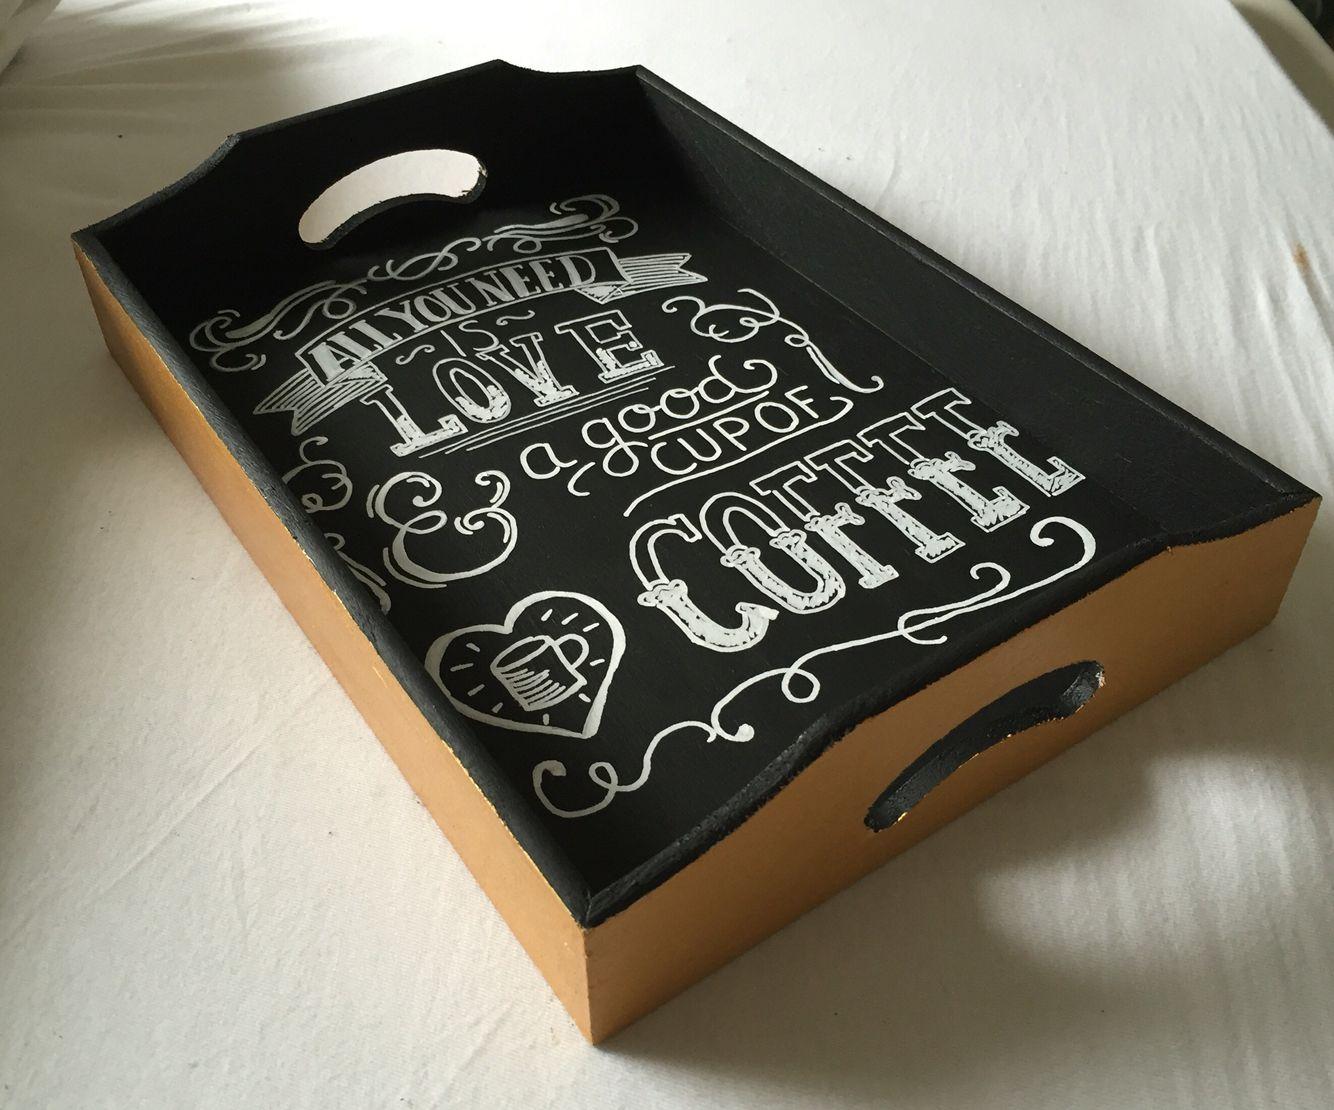 serviertablett mit tafelfarbe zum um beschriften. Black Bedroom Furniture Sets. Home Design Ideas